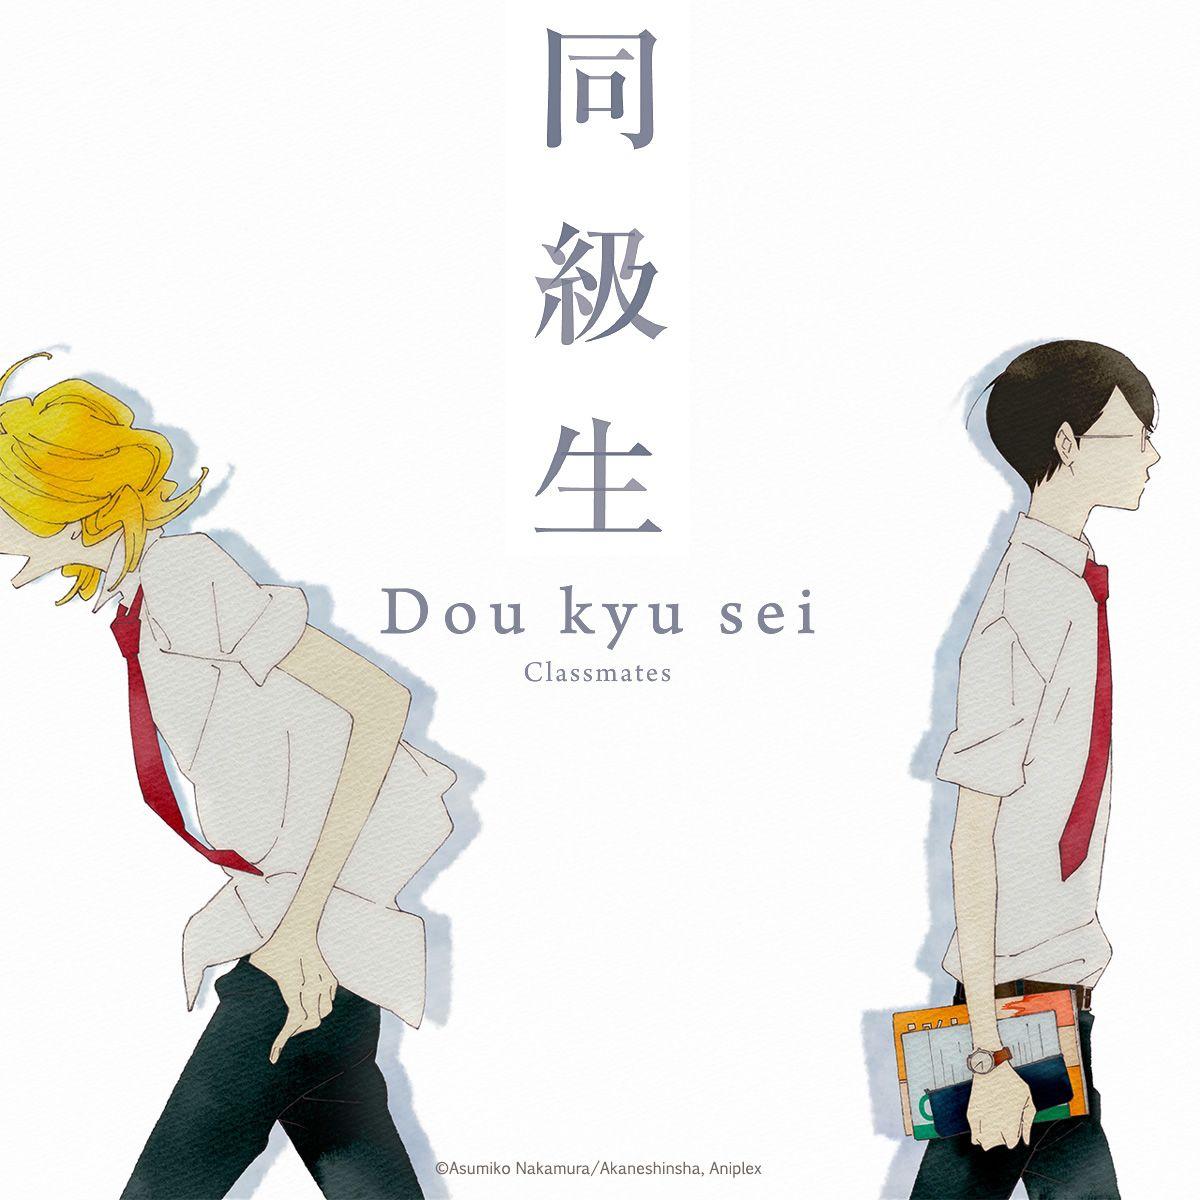 Ver Doukyuusei Pelicula Completa Sub Espanol Online Gratis En Espanol Doukyuusei Anime Films Anime Movies